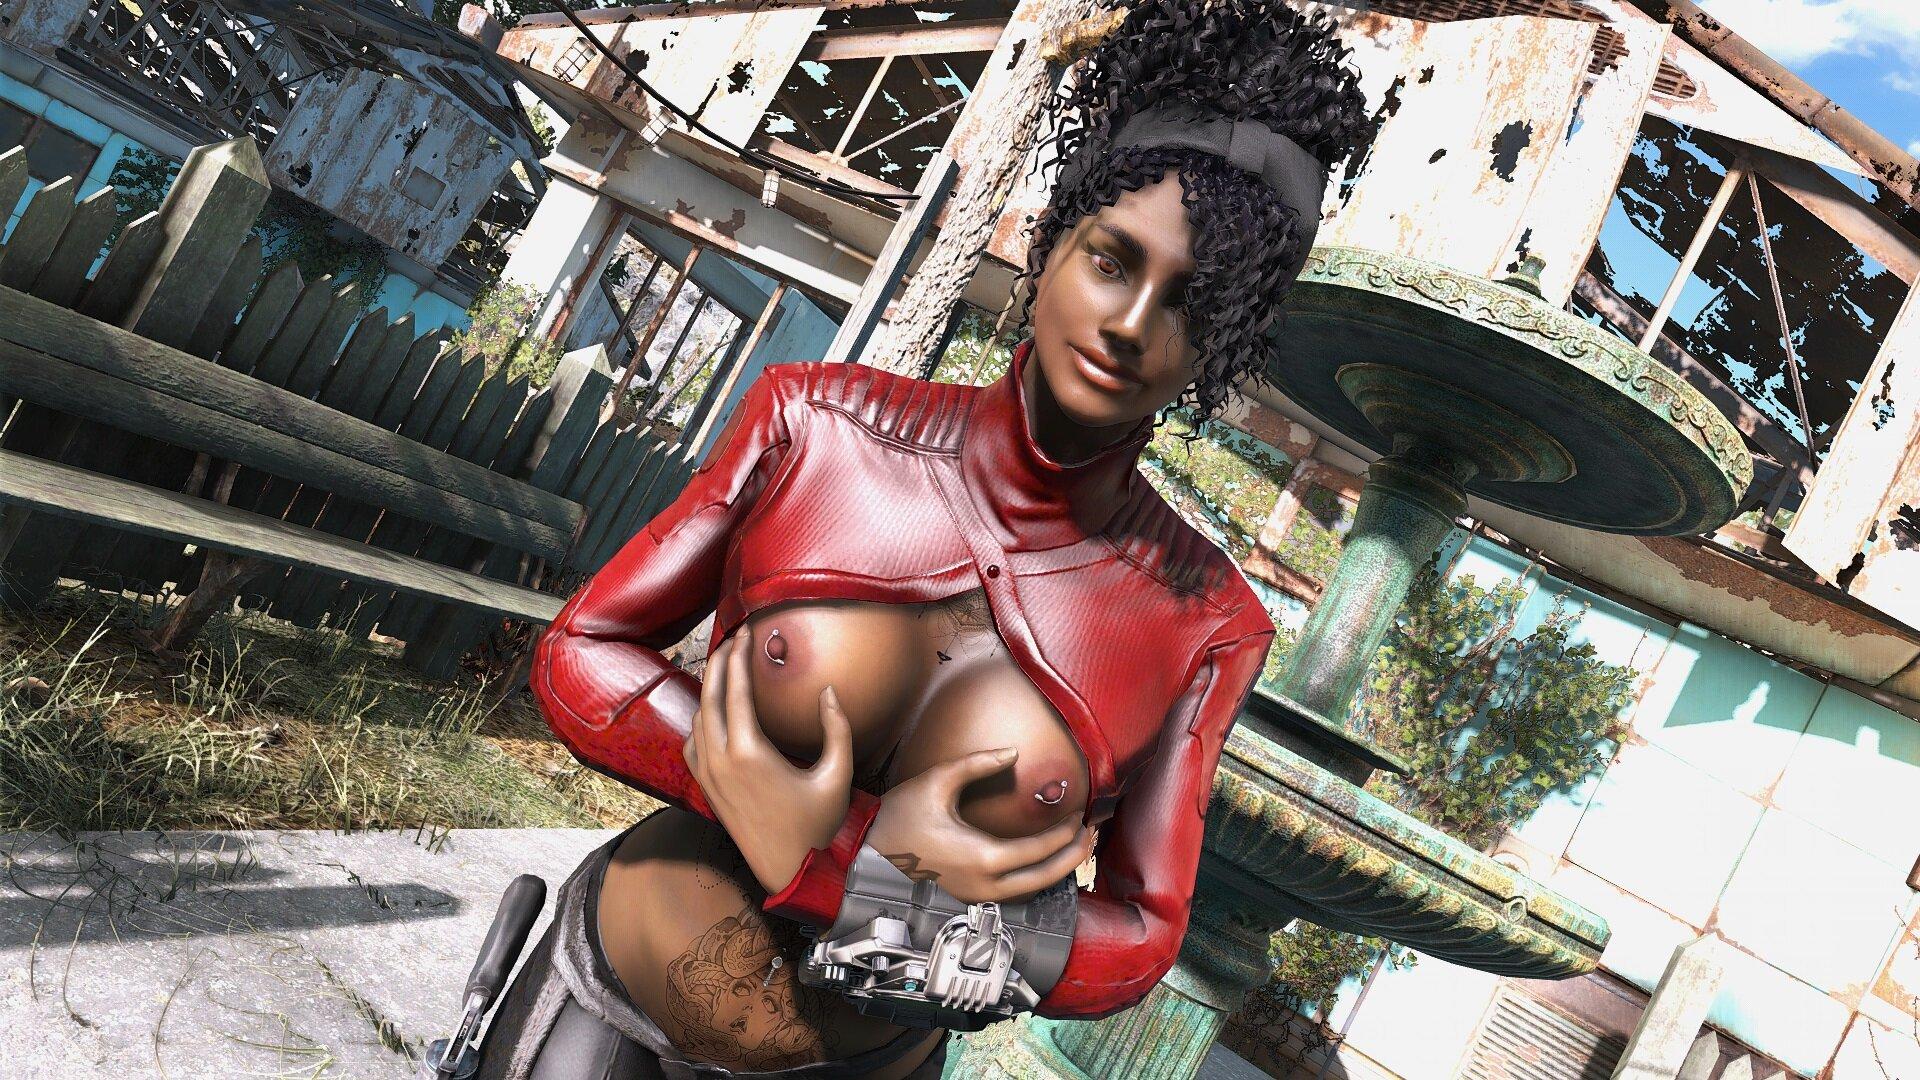 Fallout4 2021-07-23 18-03-17-58.jpg